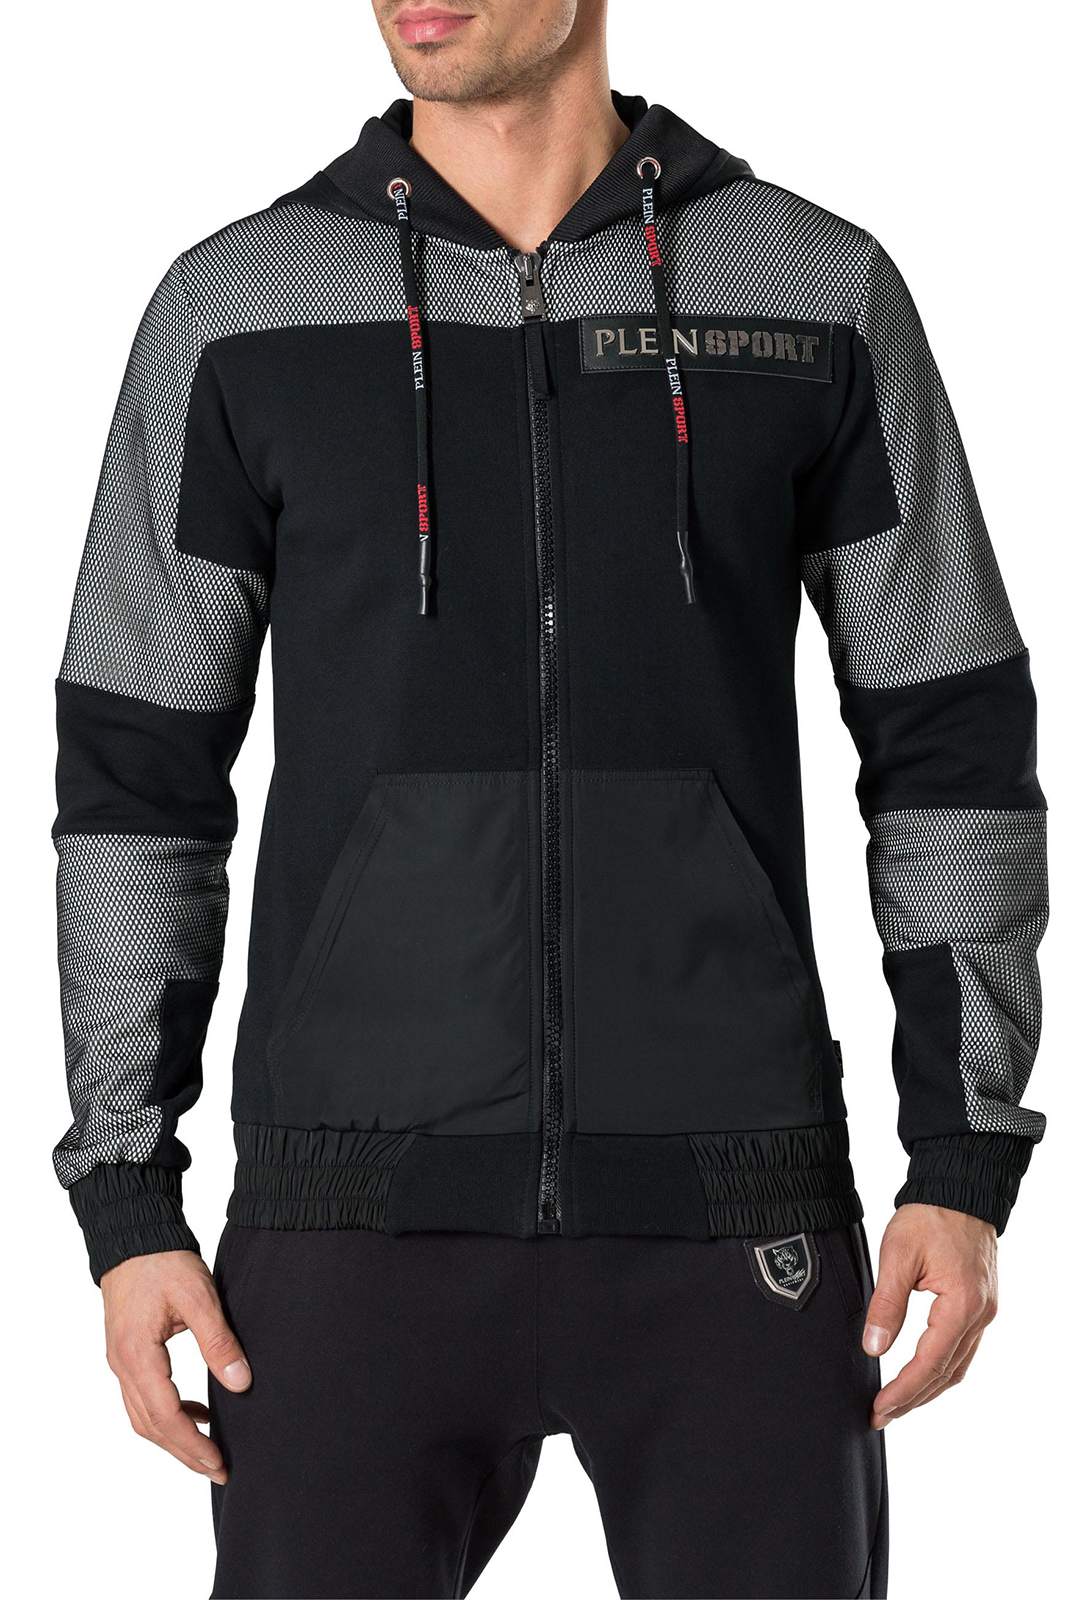 Vestes zippées  Plein Sport P17C MJB0081 02 BLACK